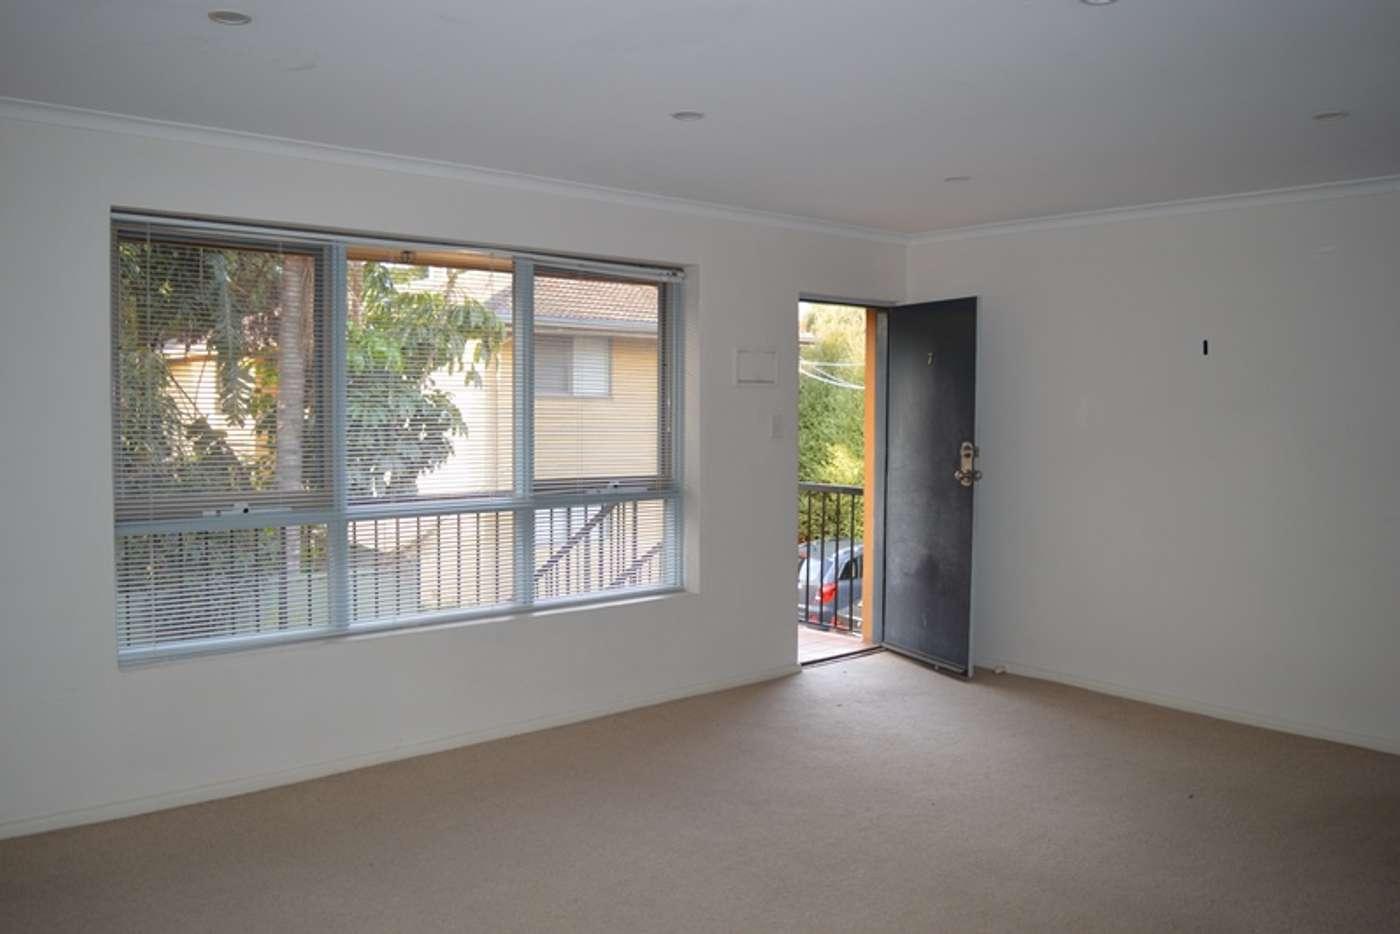 Sixth view of Homely unit listing, 7/4 Glebe Avenue, Cheltenham VIC 3192